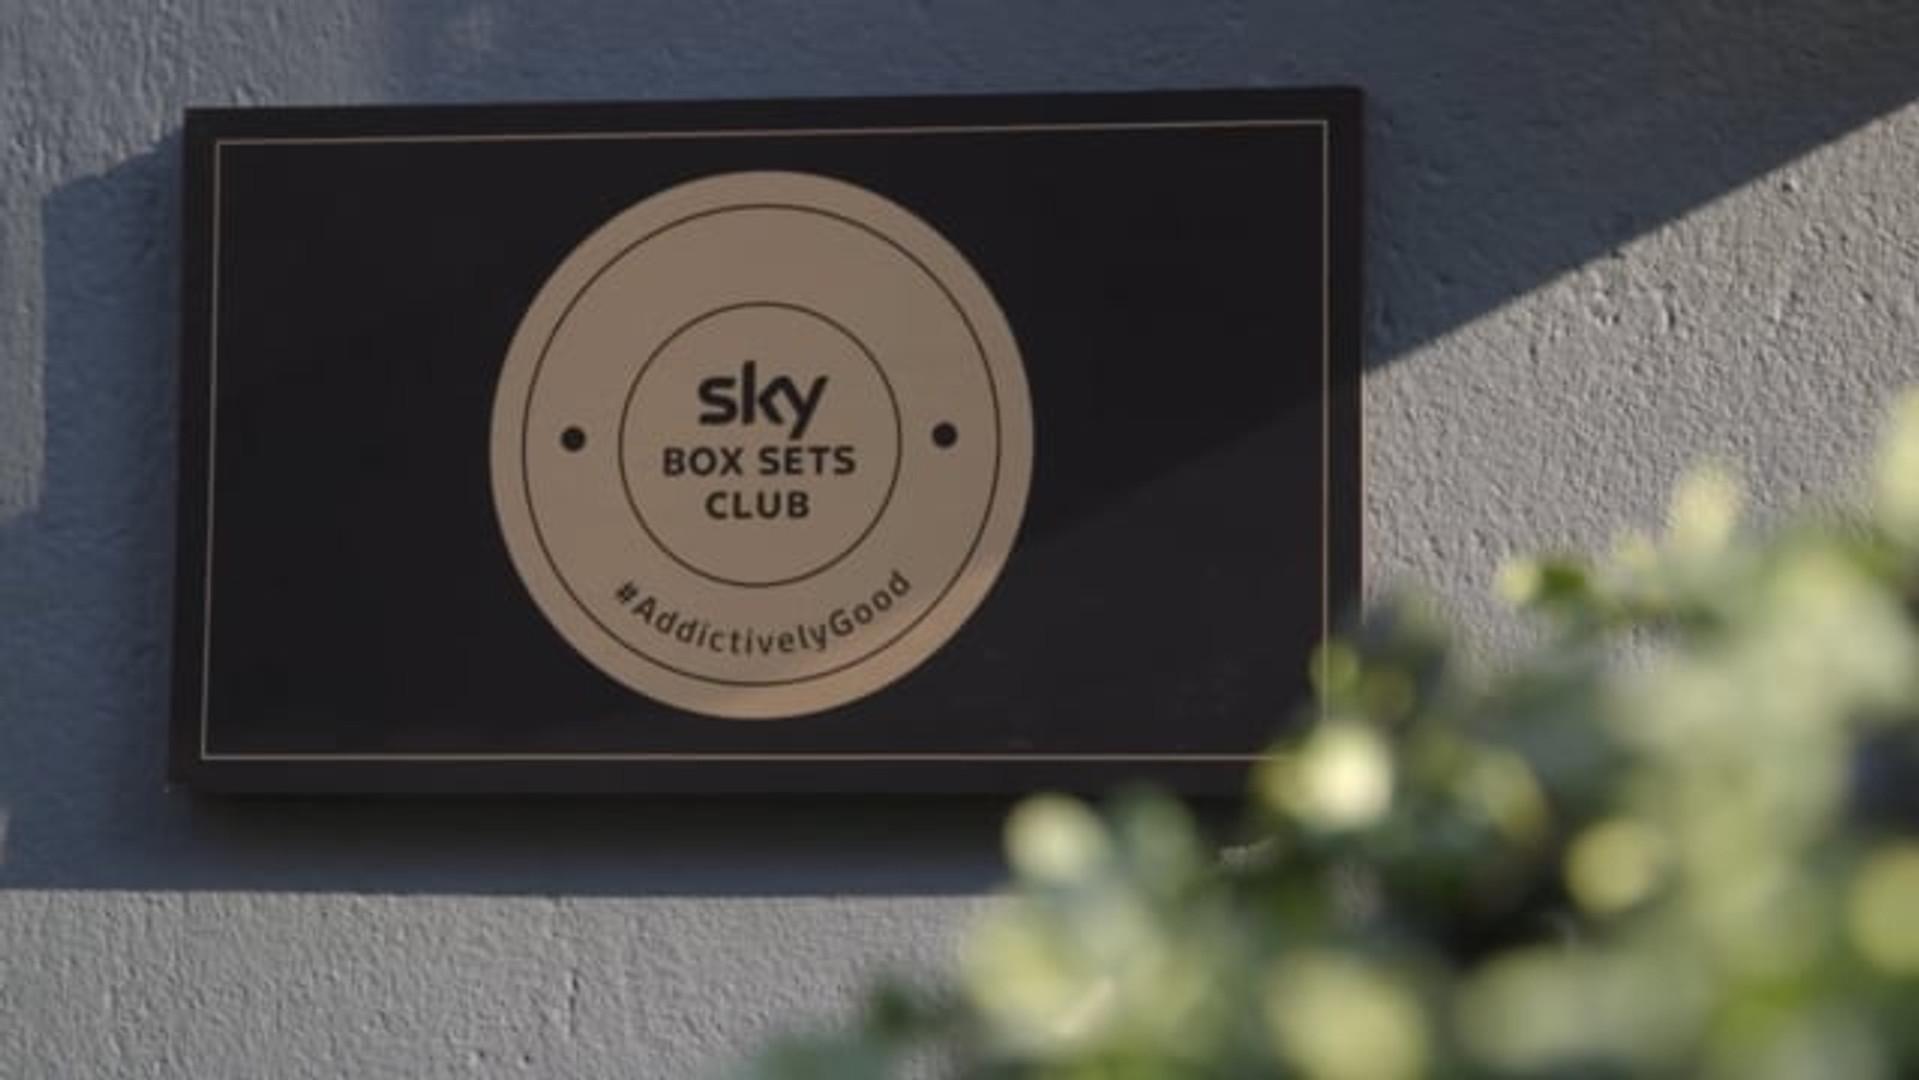 Sky Box Sets Launch